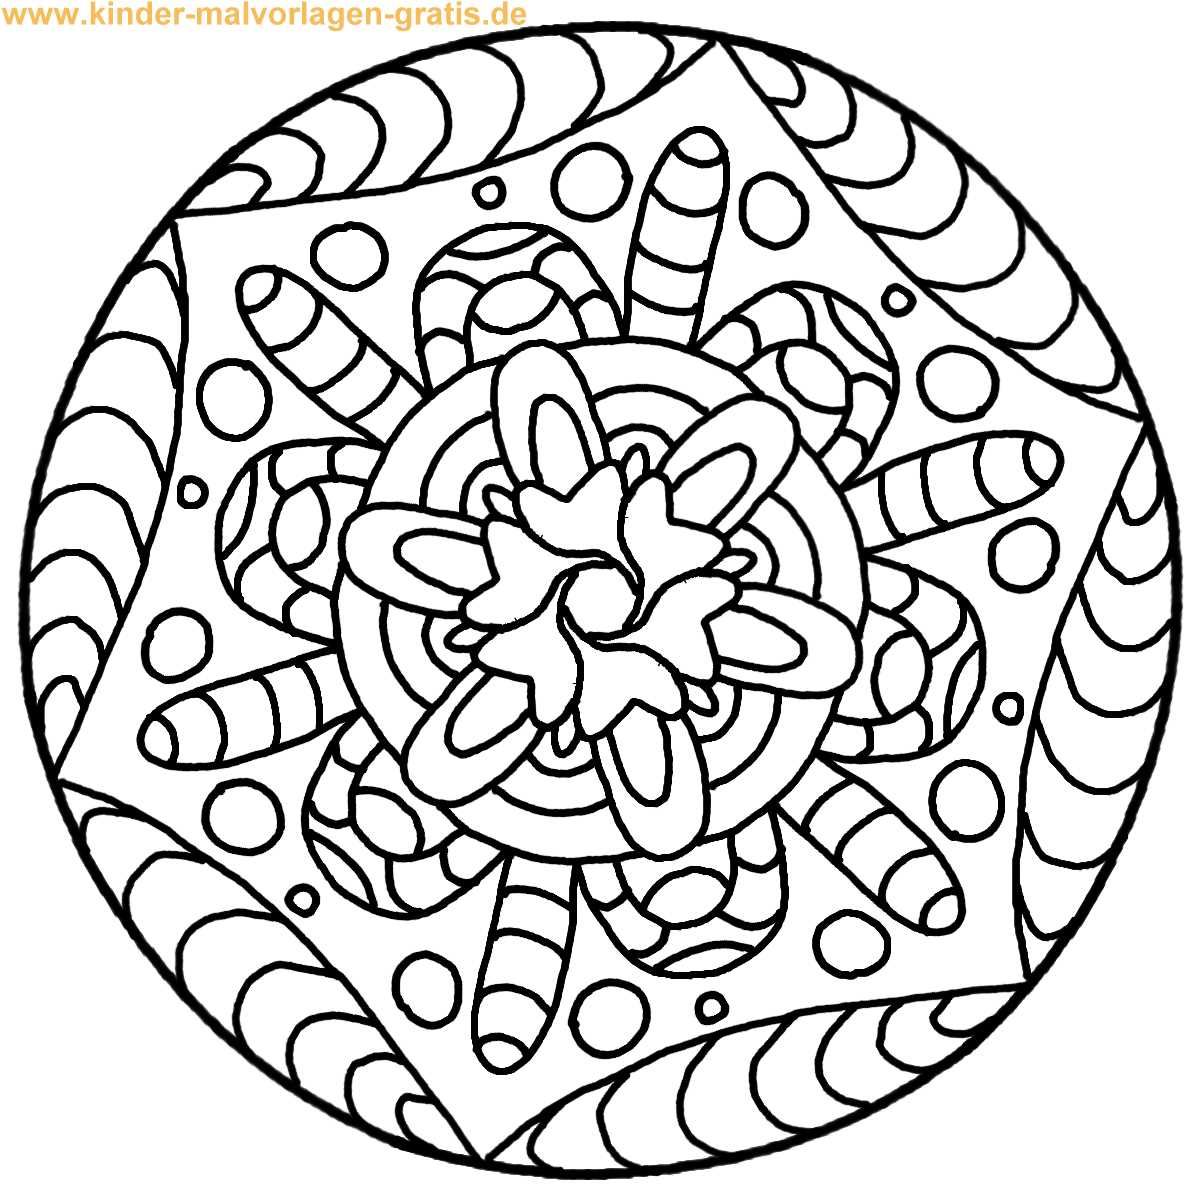 Malvorlage Mandala für Kinder | Coloring | Pinterest | Mandalas